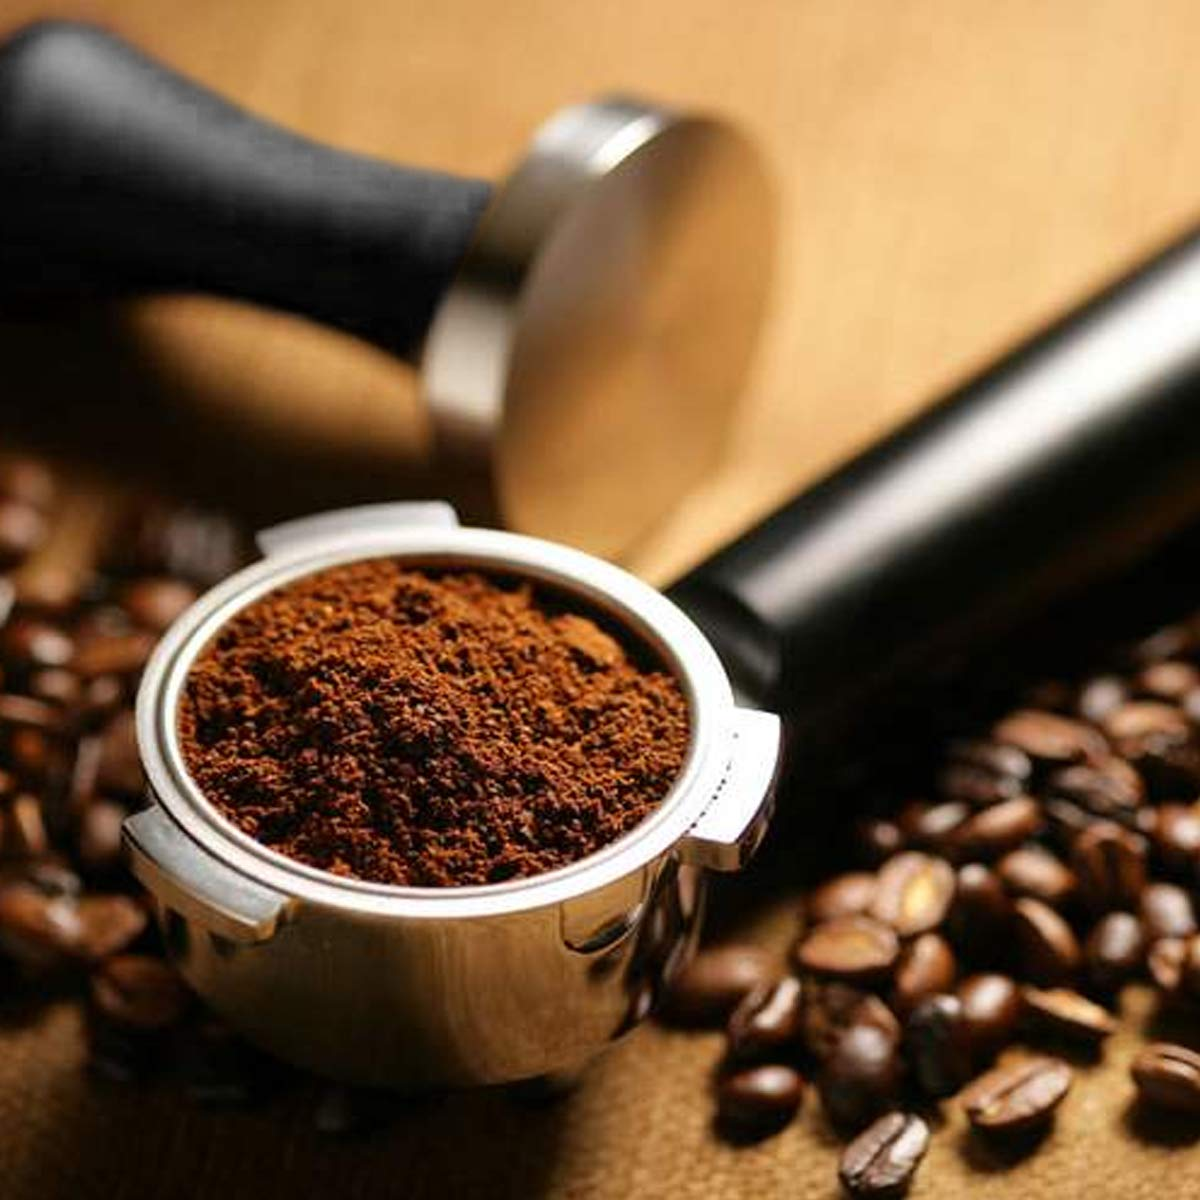 Black Ergonomic Handle Powder Press Premium Barista Coffee Compactor with 100/% Flat Stainless Steel Base Wingjip 53mm Italian Compaction Machine